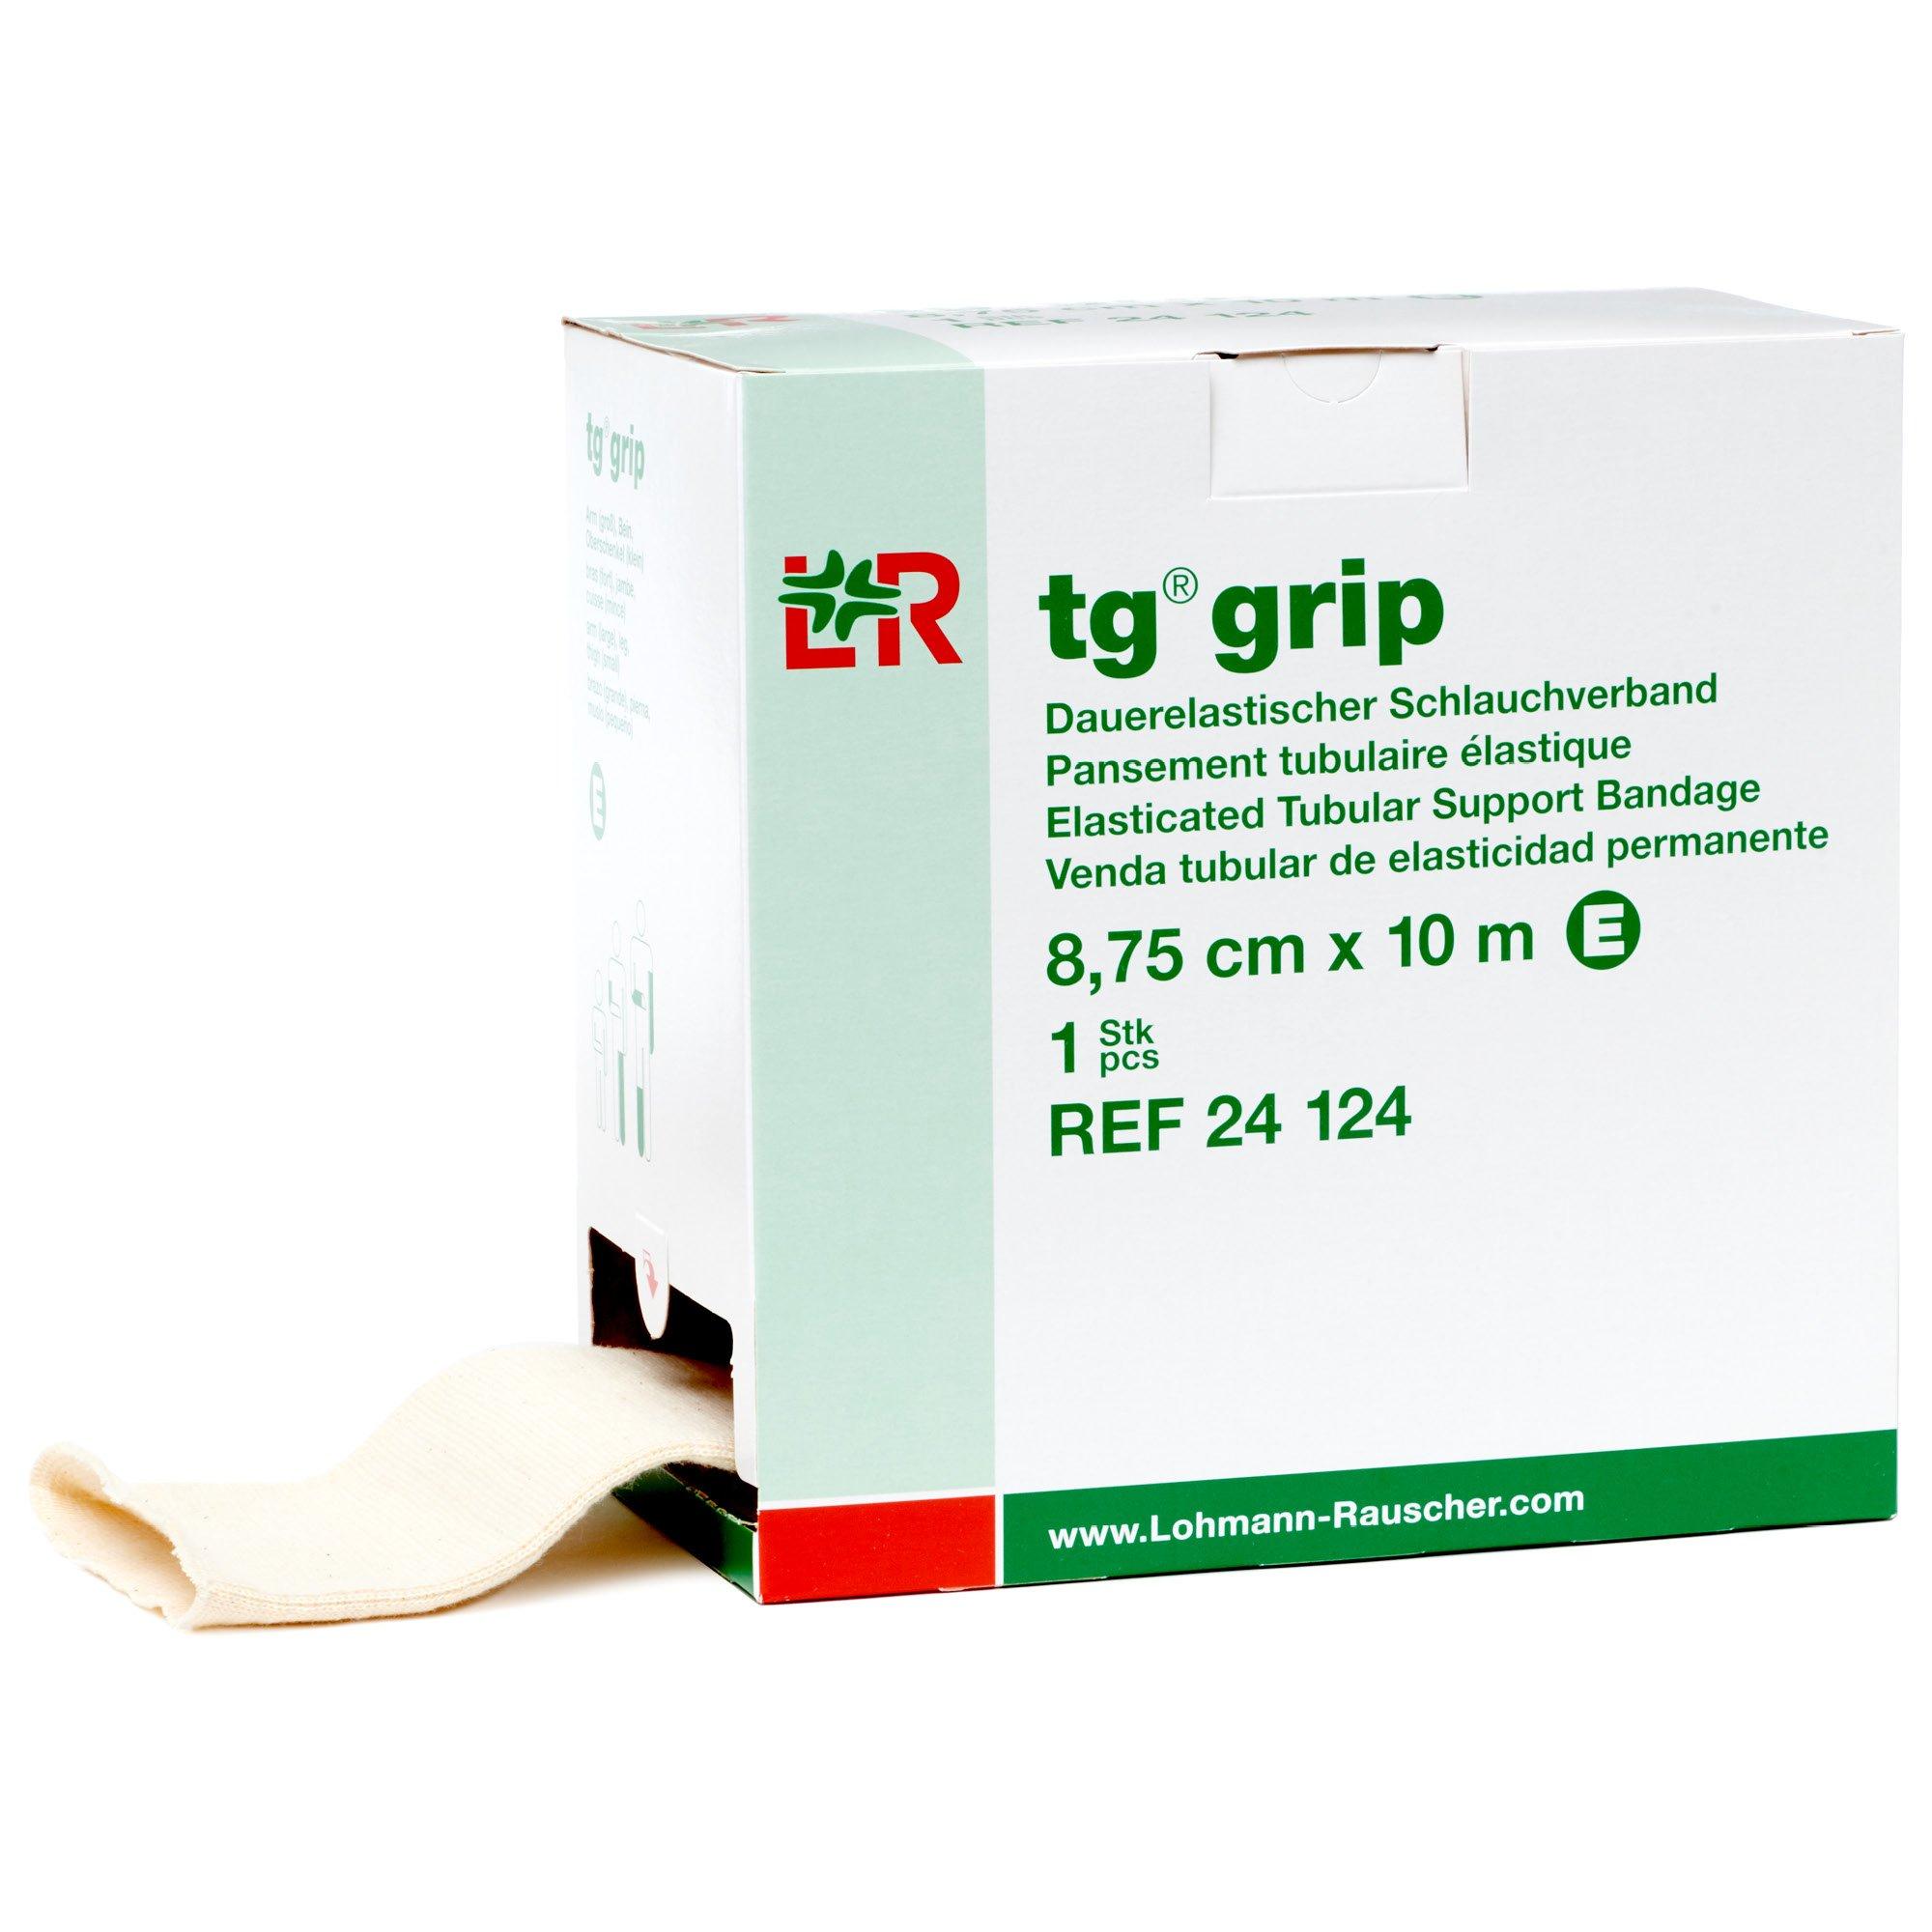 tg grip Elastic Tubular Compression Bandage, Seamless Tube Stockinette Wrap for Retention, Lymphedema, & Swelling, 85% Cotton, Washable & Reusable, Size E